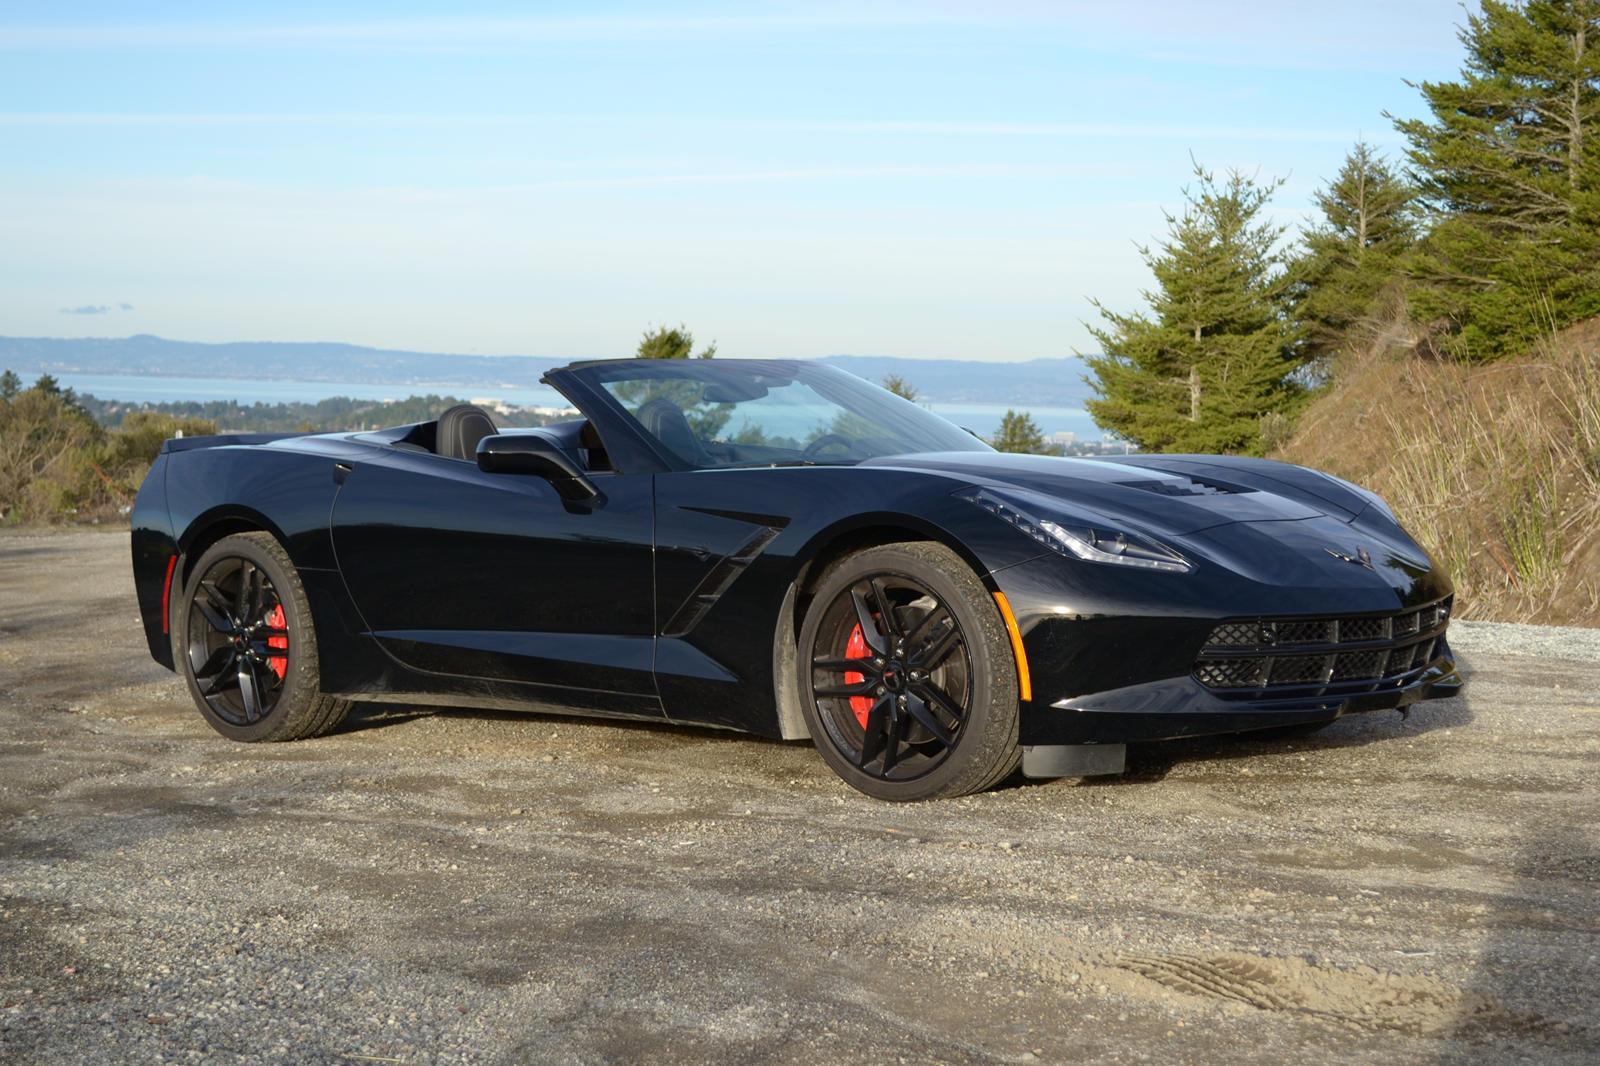 2735 2019 Chevrolet Corvette Stingray Convertible Test Drive Review: Supercar On A Budget